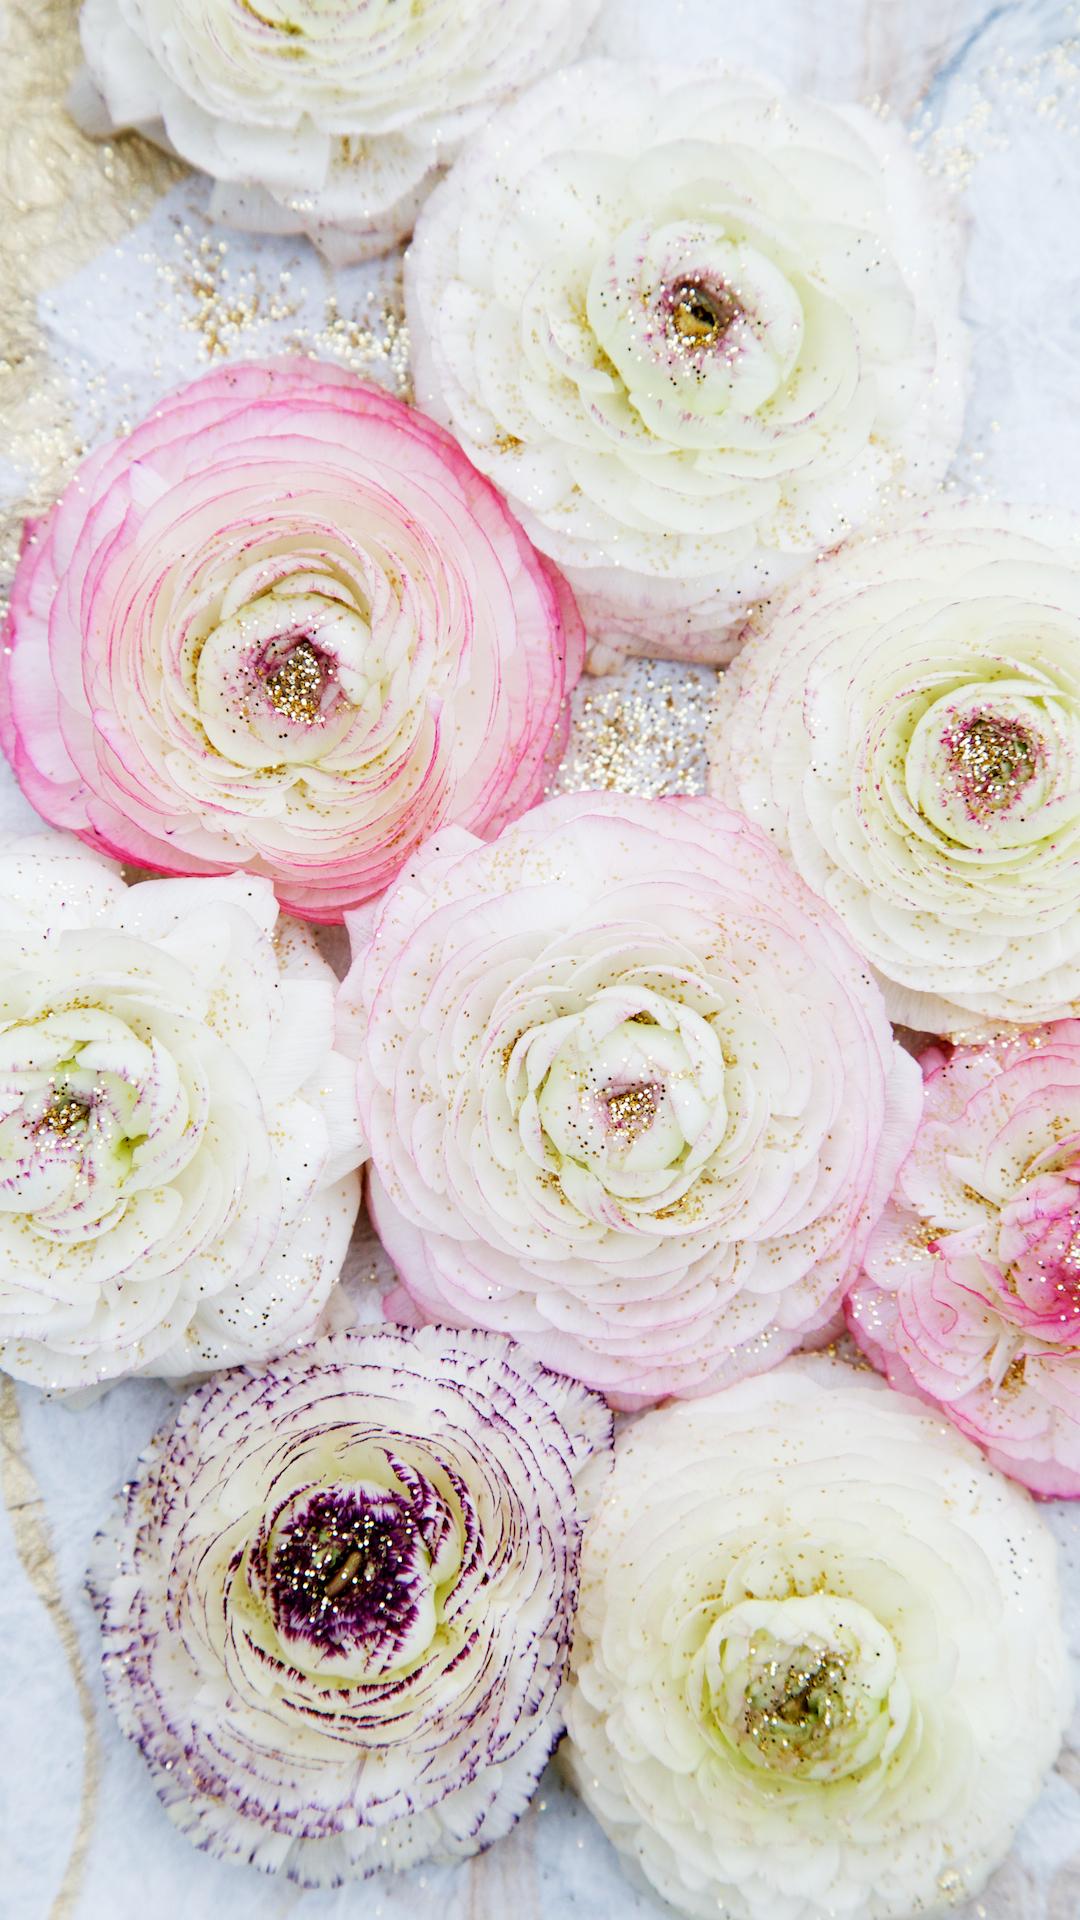 free winter floral wallpapers 3.jpg